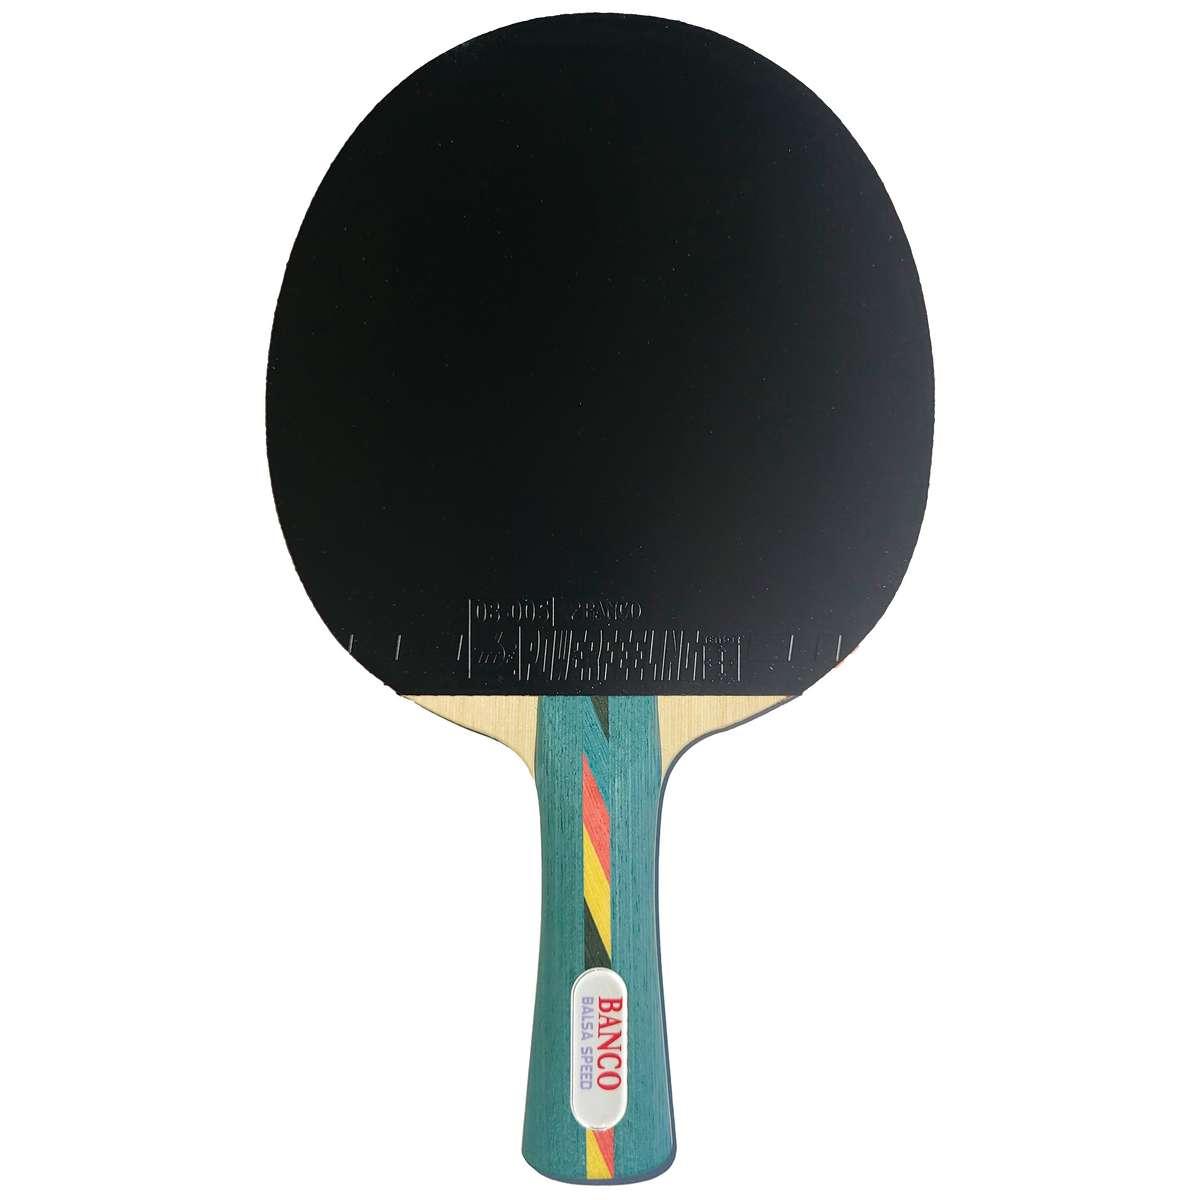 Raquette ping pong - Raquette de ping pong pas cher ...